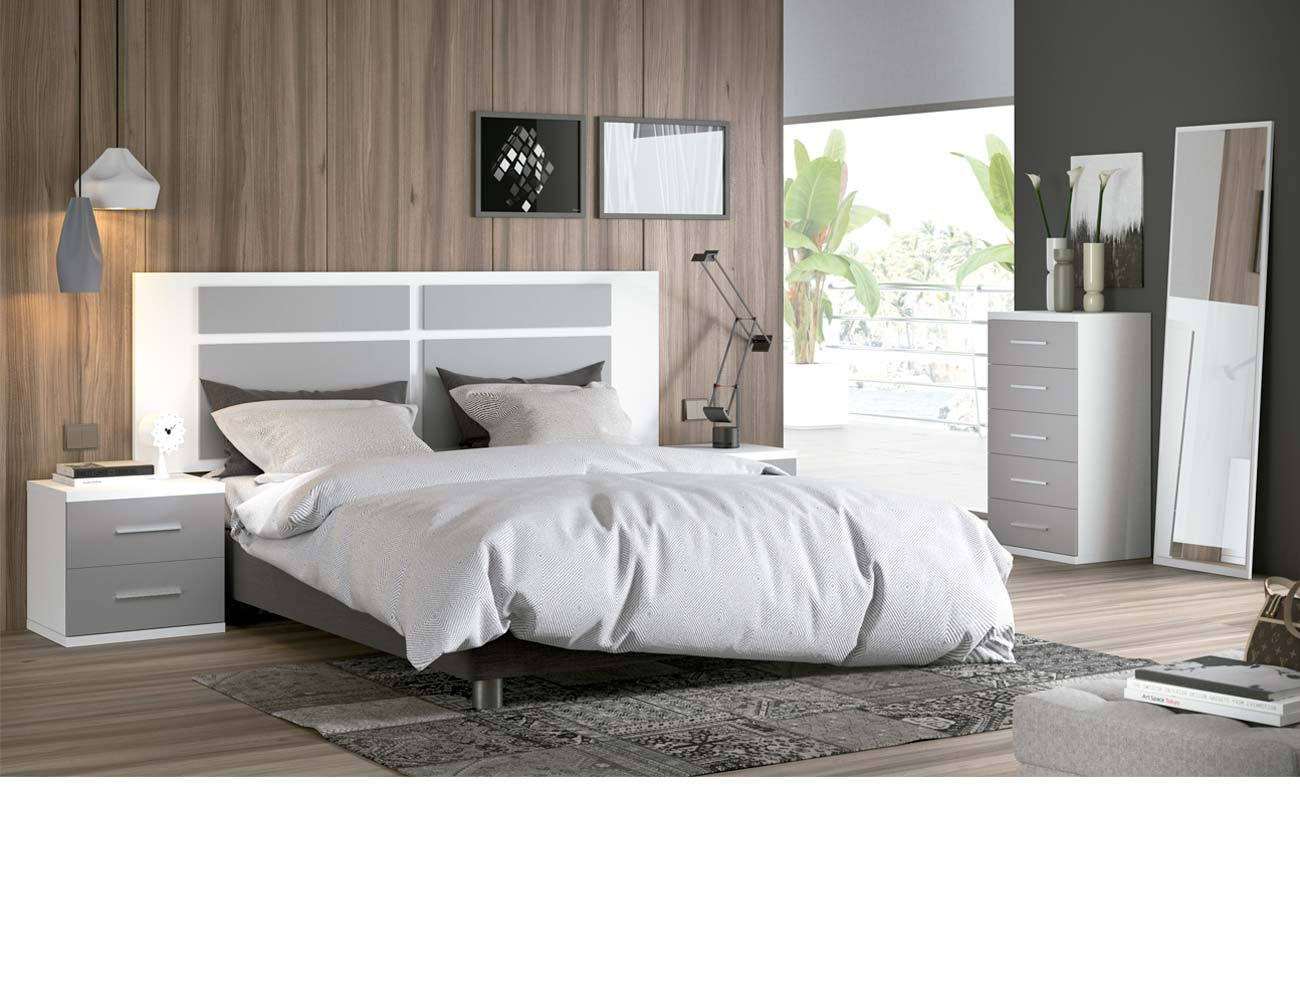 Dormitorio matrimonio moderno 29 blanco gris